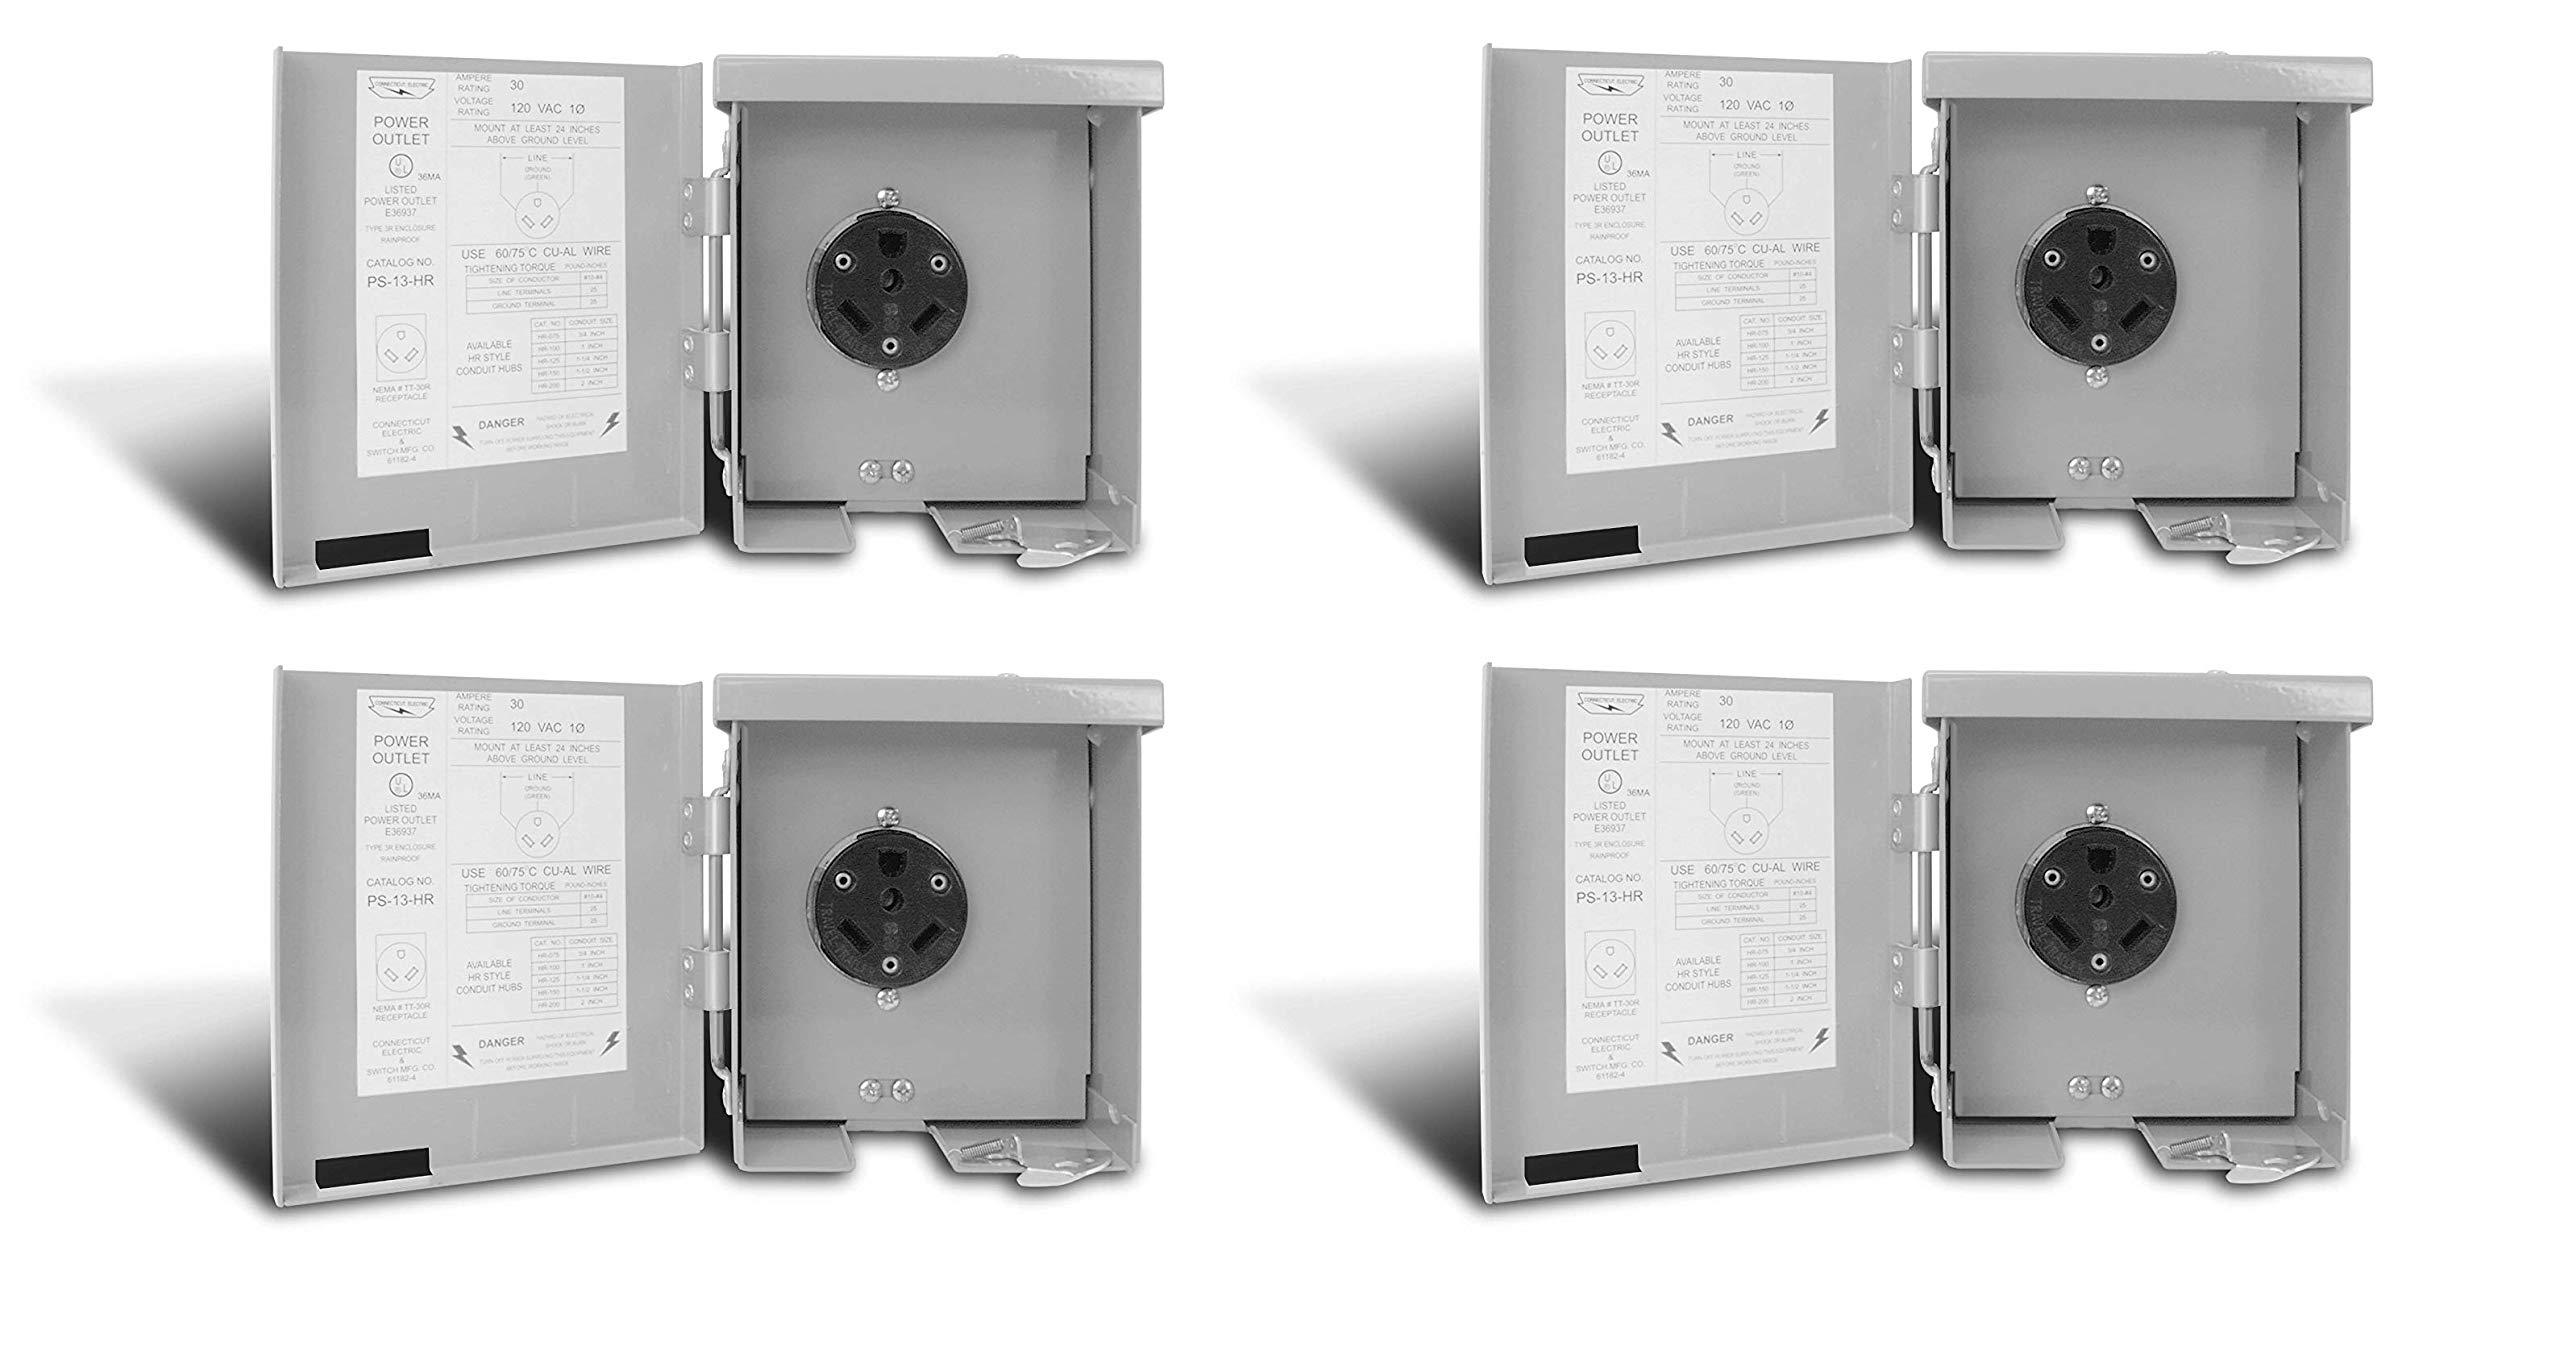 Connecticut Electric CESMPS13HR 30-Amps/120-Volt RV Power Outlet (Pack of 4)